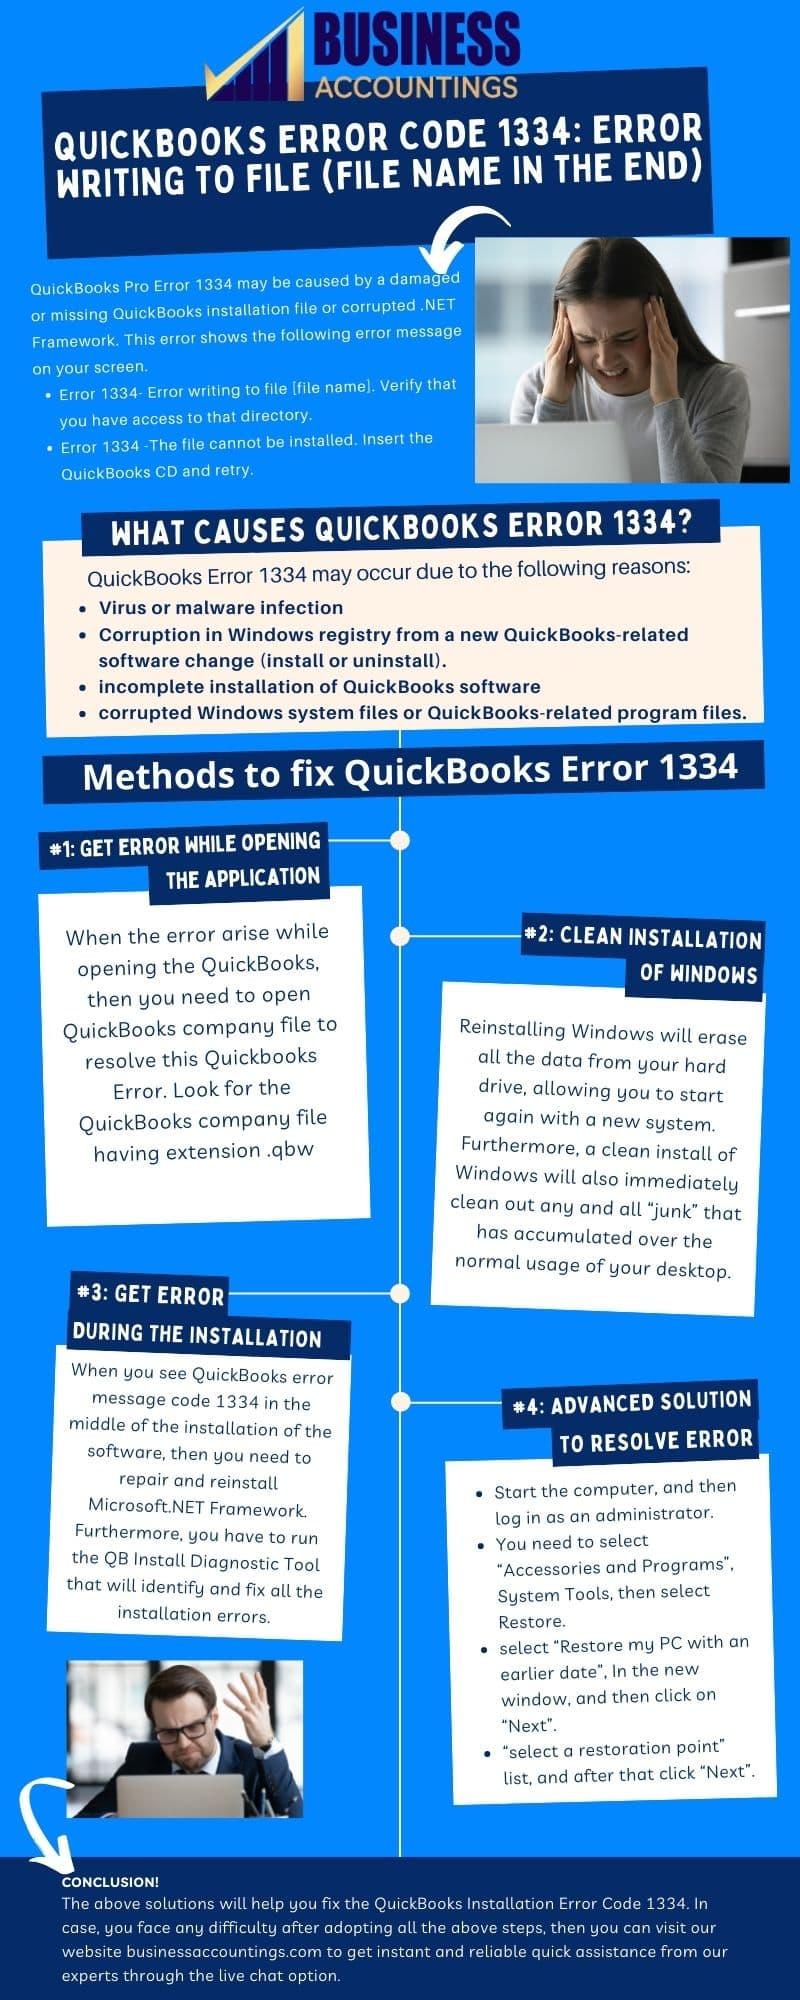 Infographic of Solutions for Quickbooks Error 1334